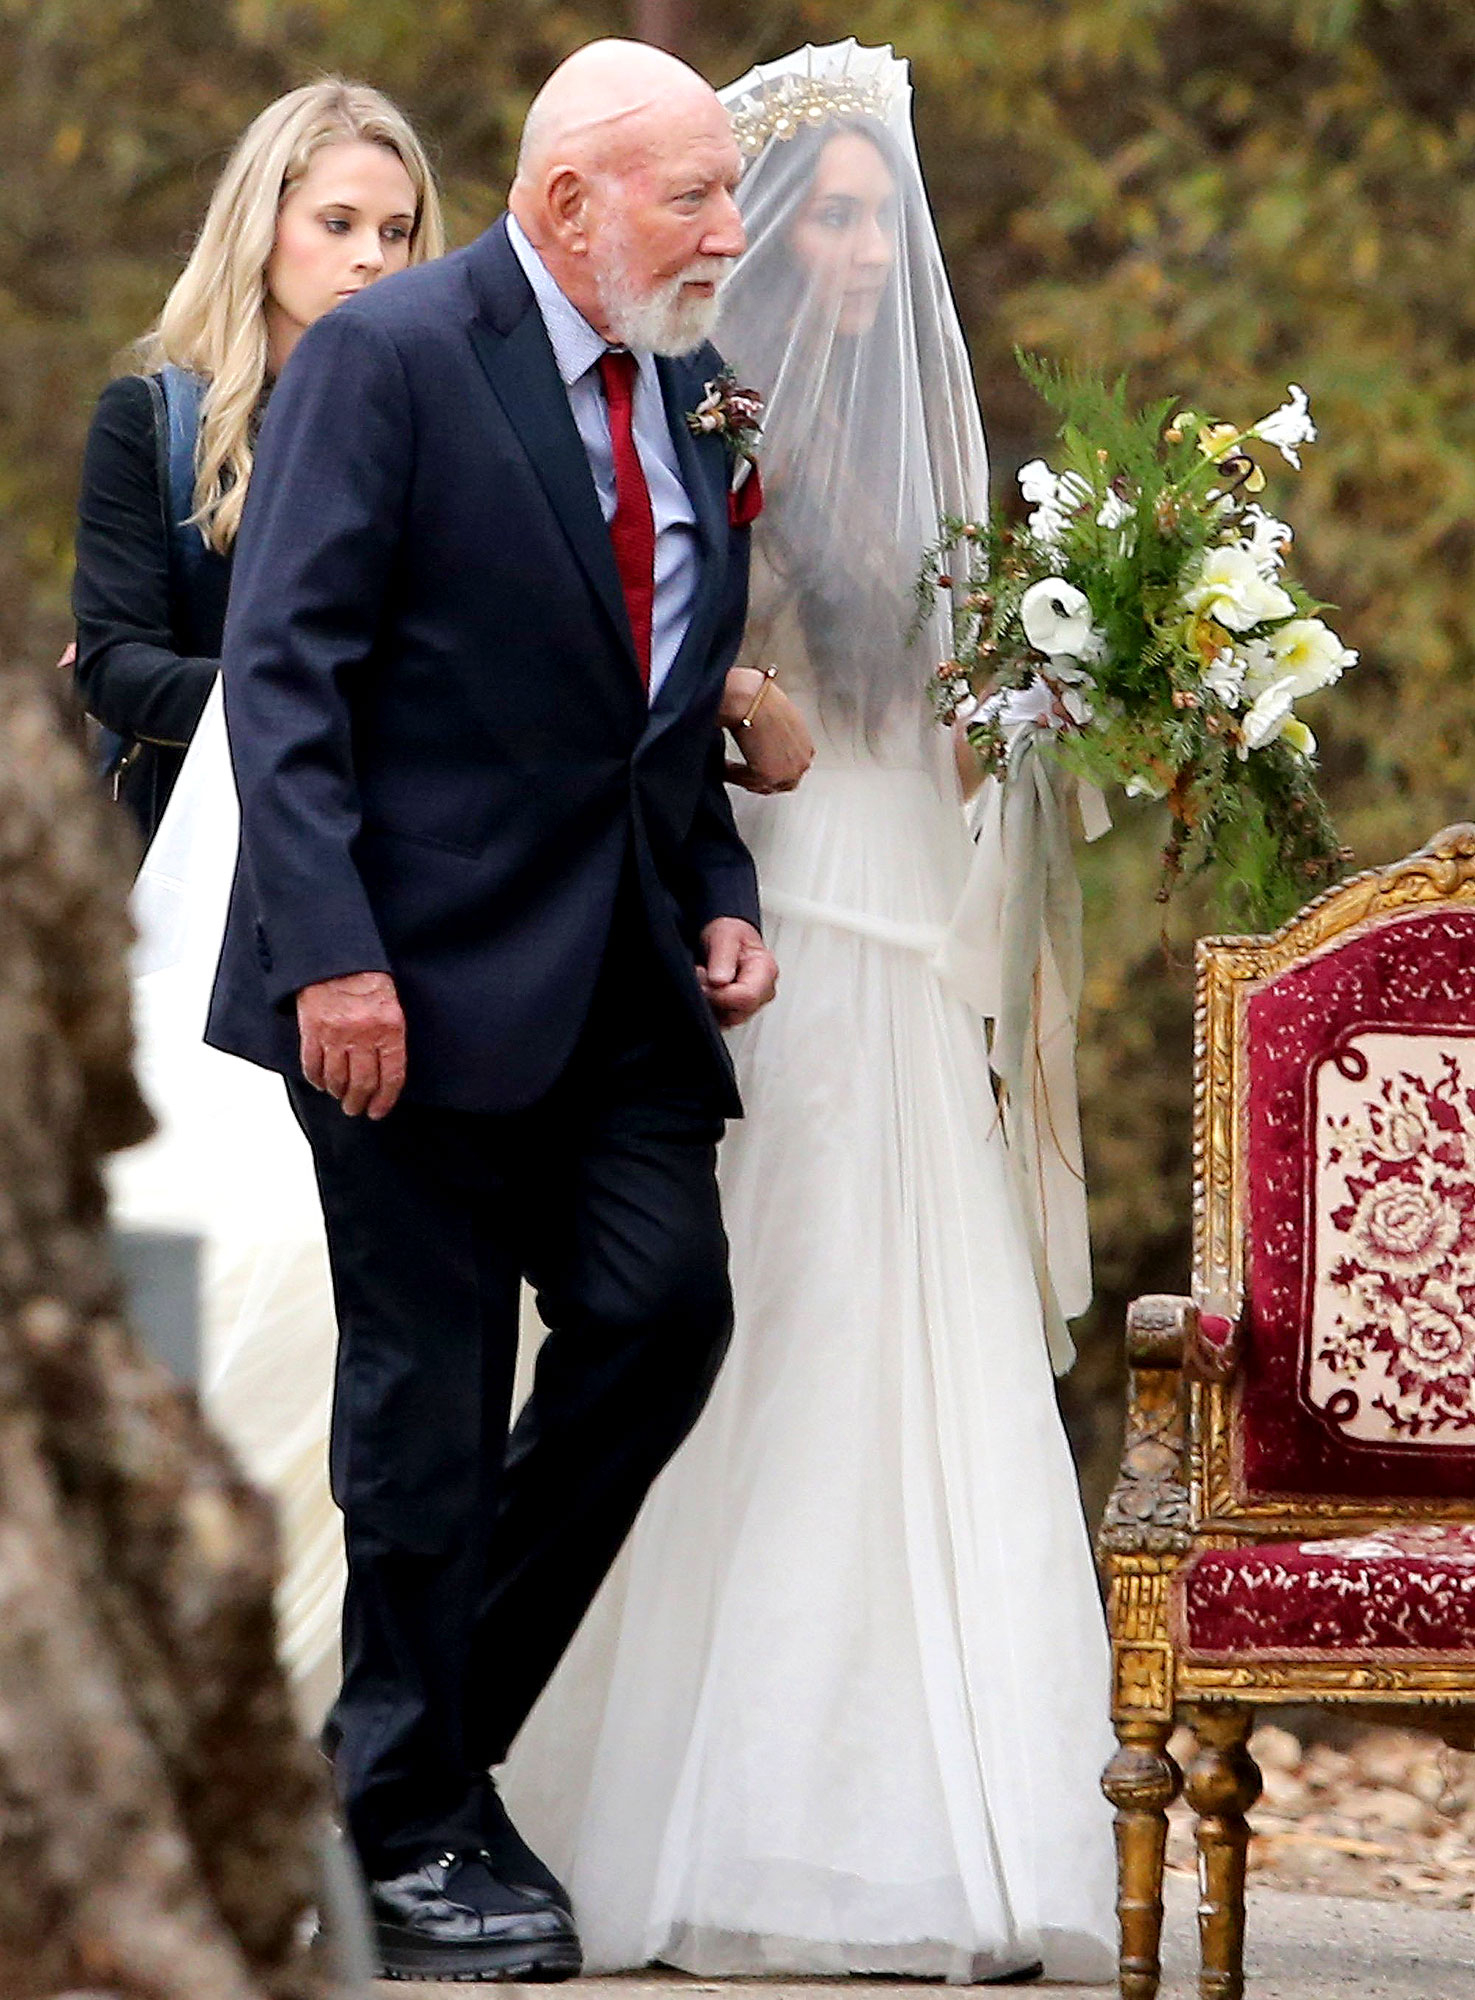 Troian bellisarios boho wedding dress all the details troian bellisario with dad donald bellisario chose the perfect boho wedding dress for her rustic wedding to patrick adams on saturday december 10 izmirmasajfo